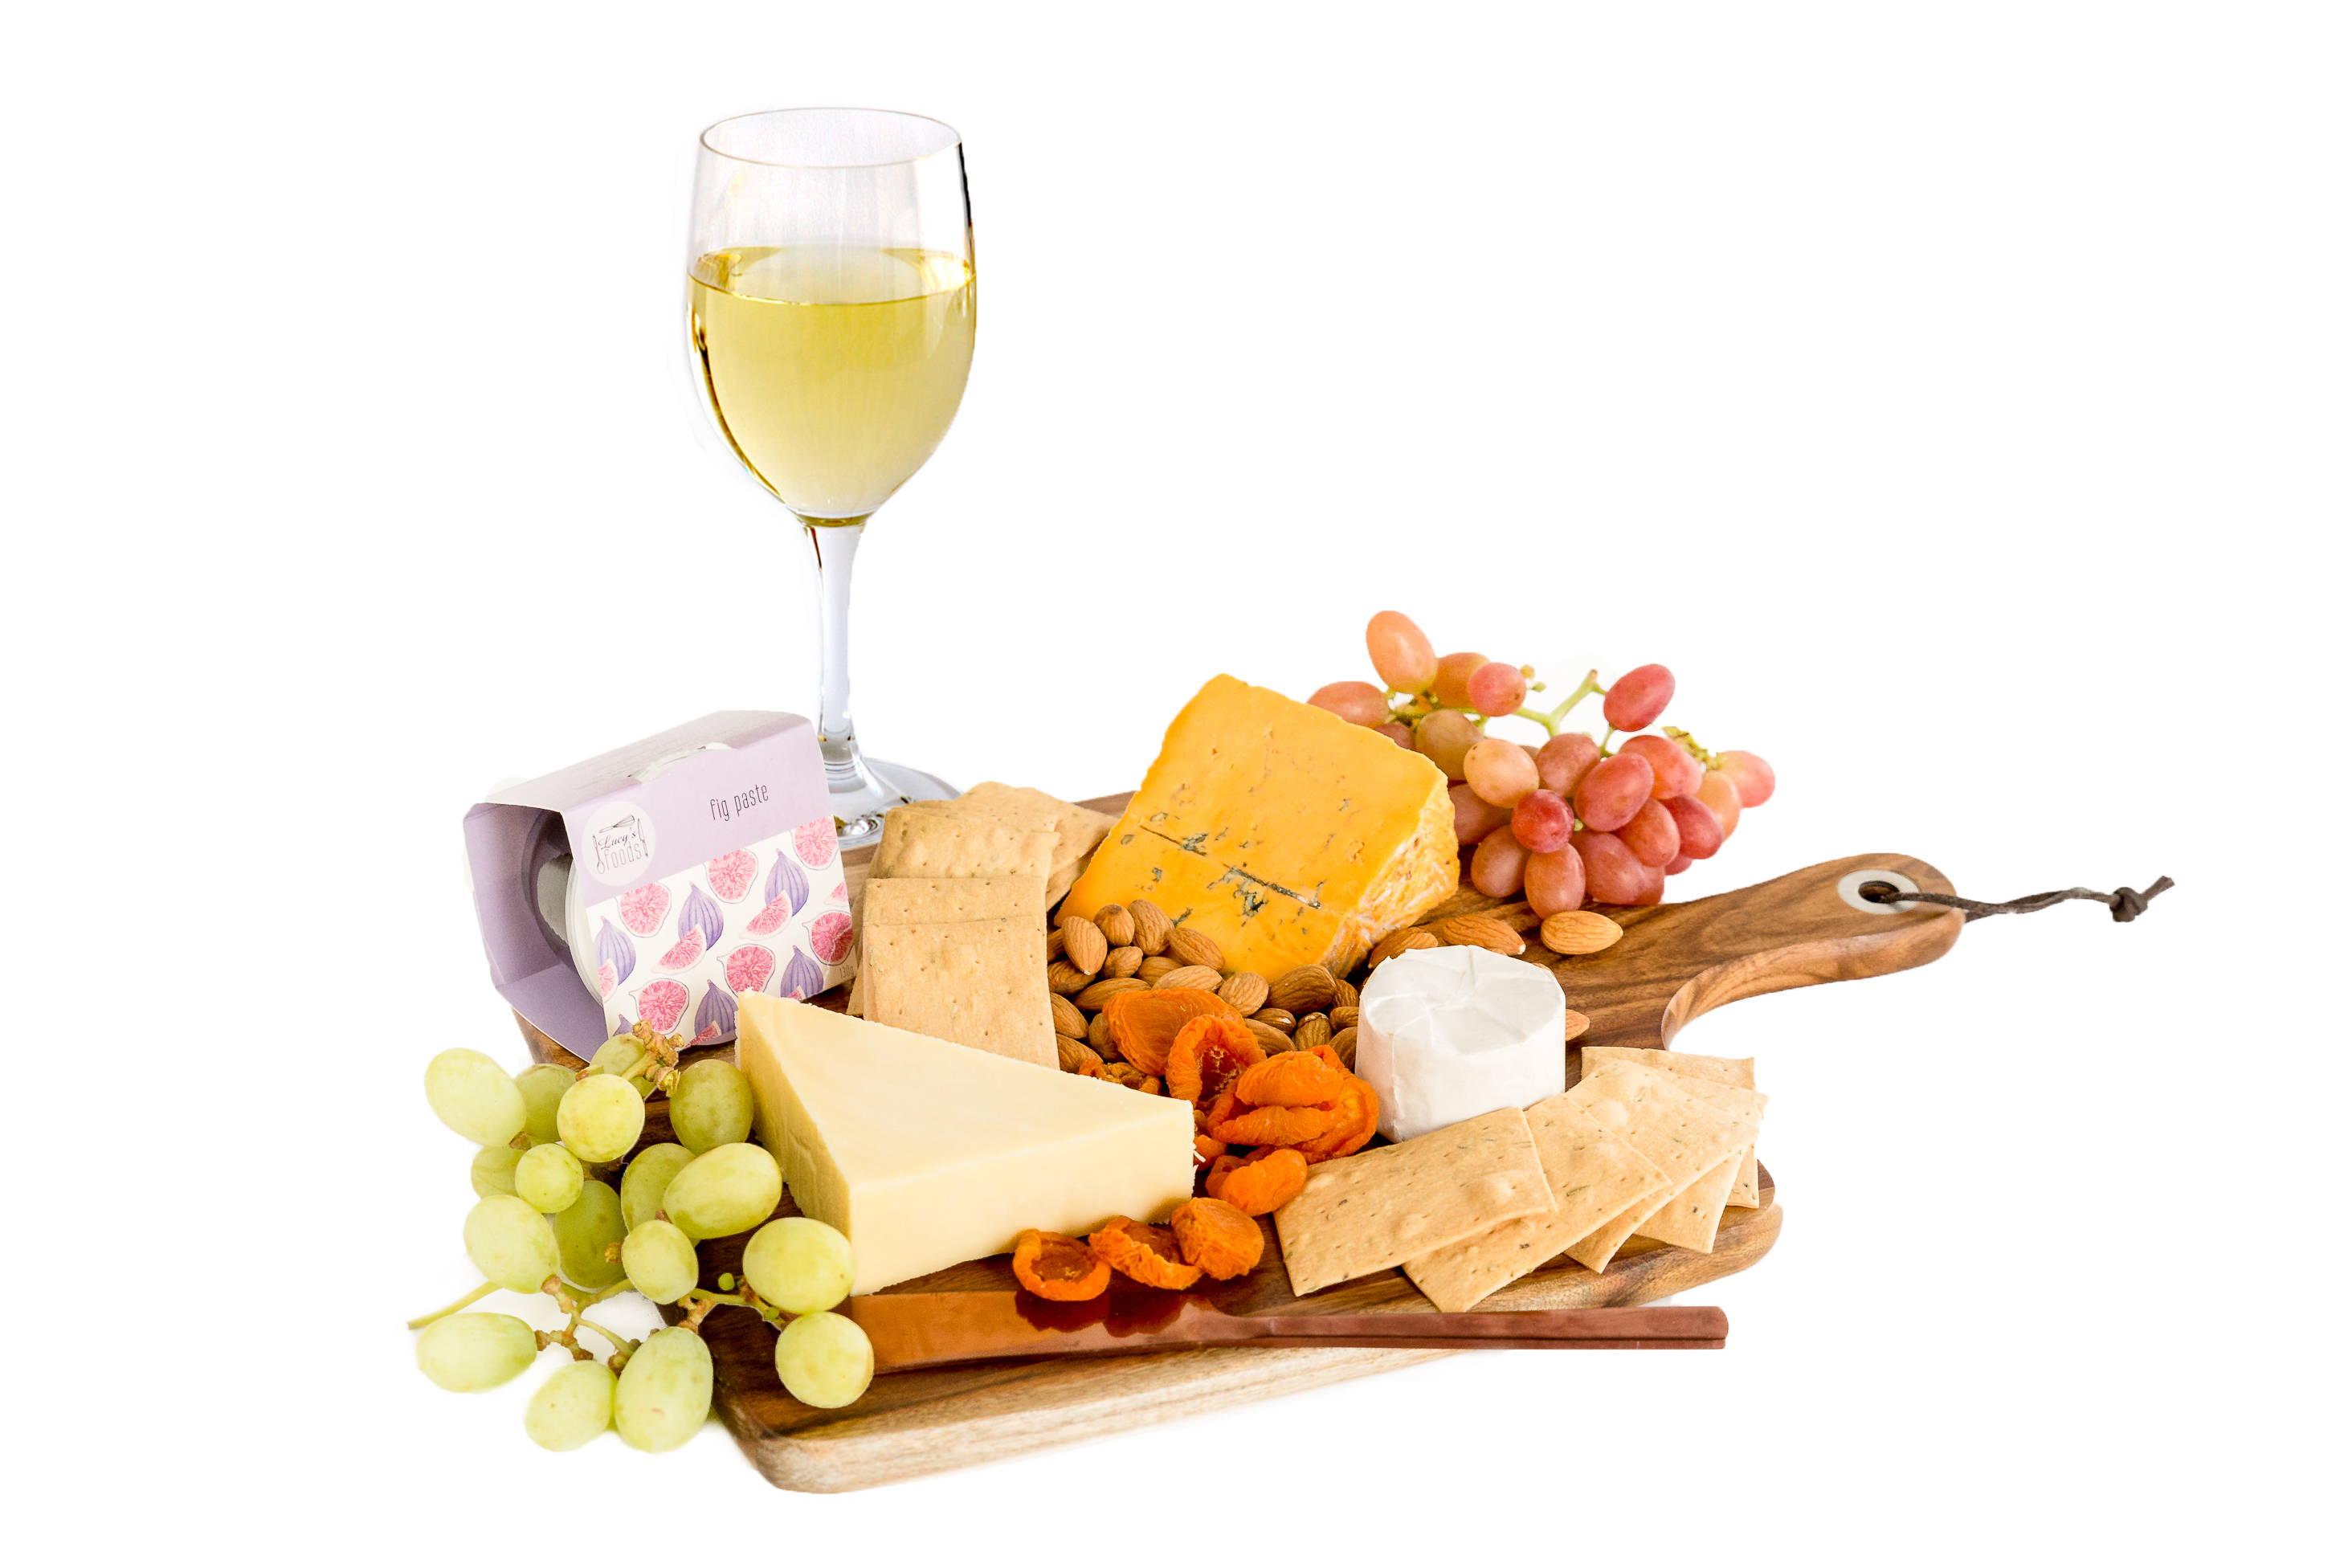 Small Australian wine and cheese platter